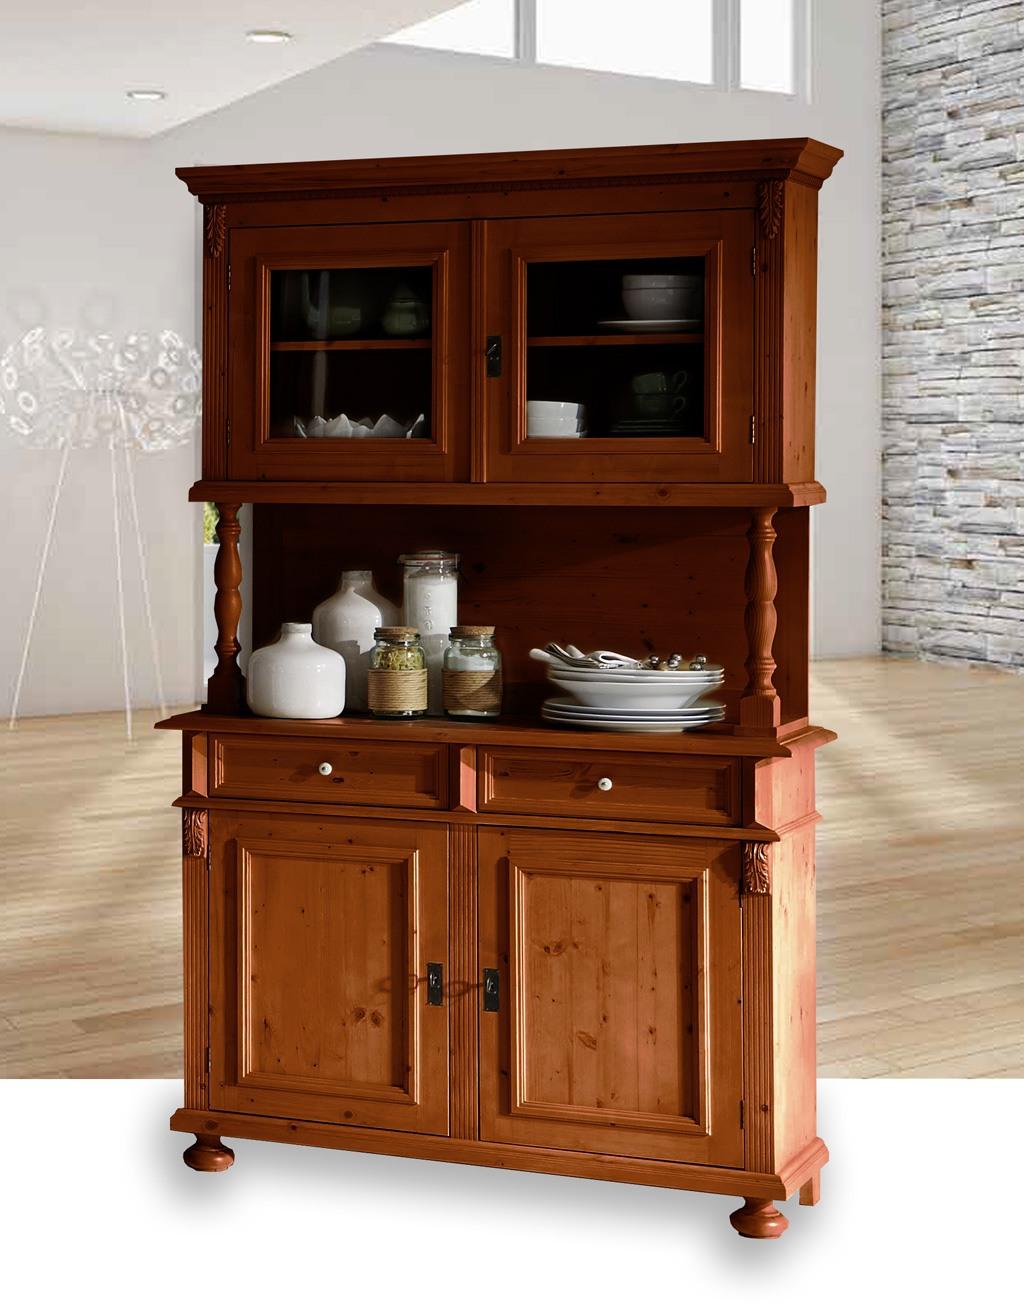 esszimmer landhausstil braun. Black Bedroom Furniture Sets. Home Design Ideas